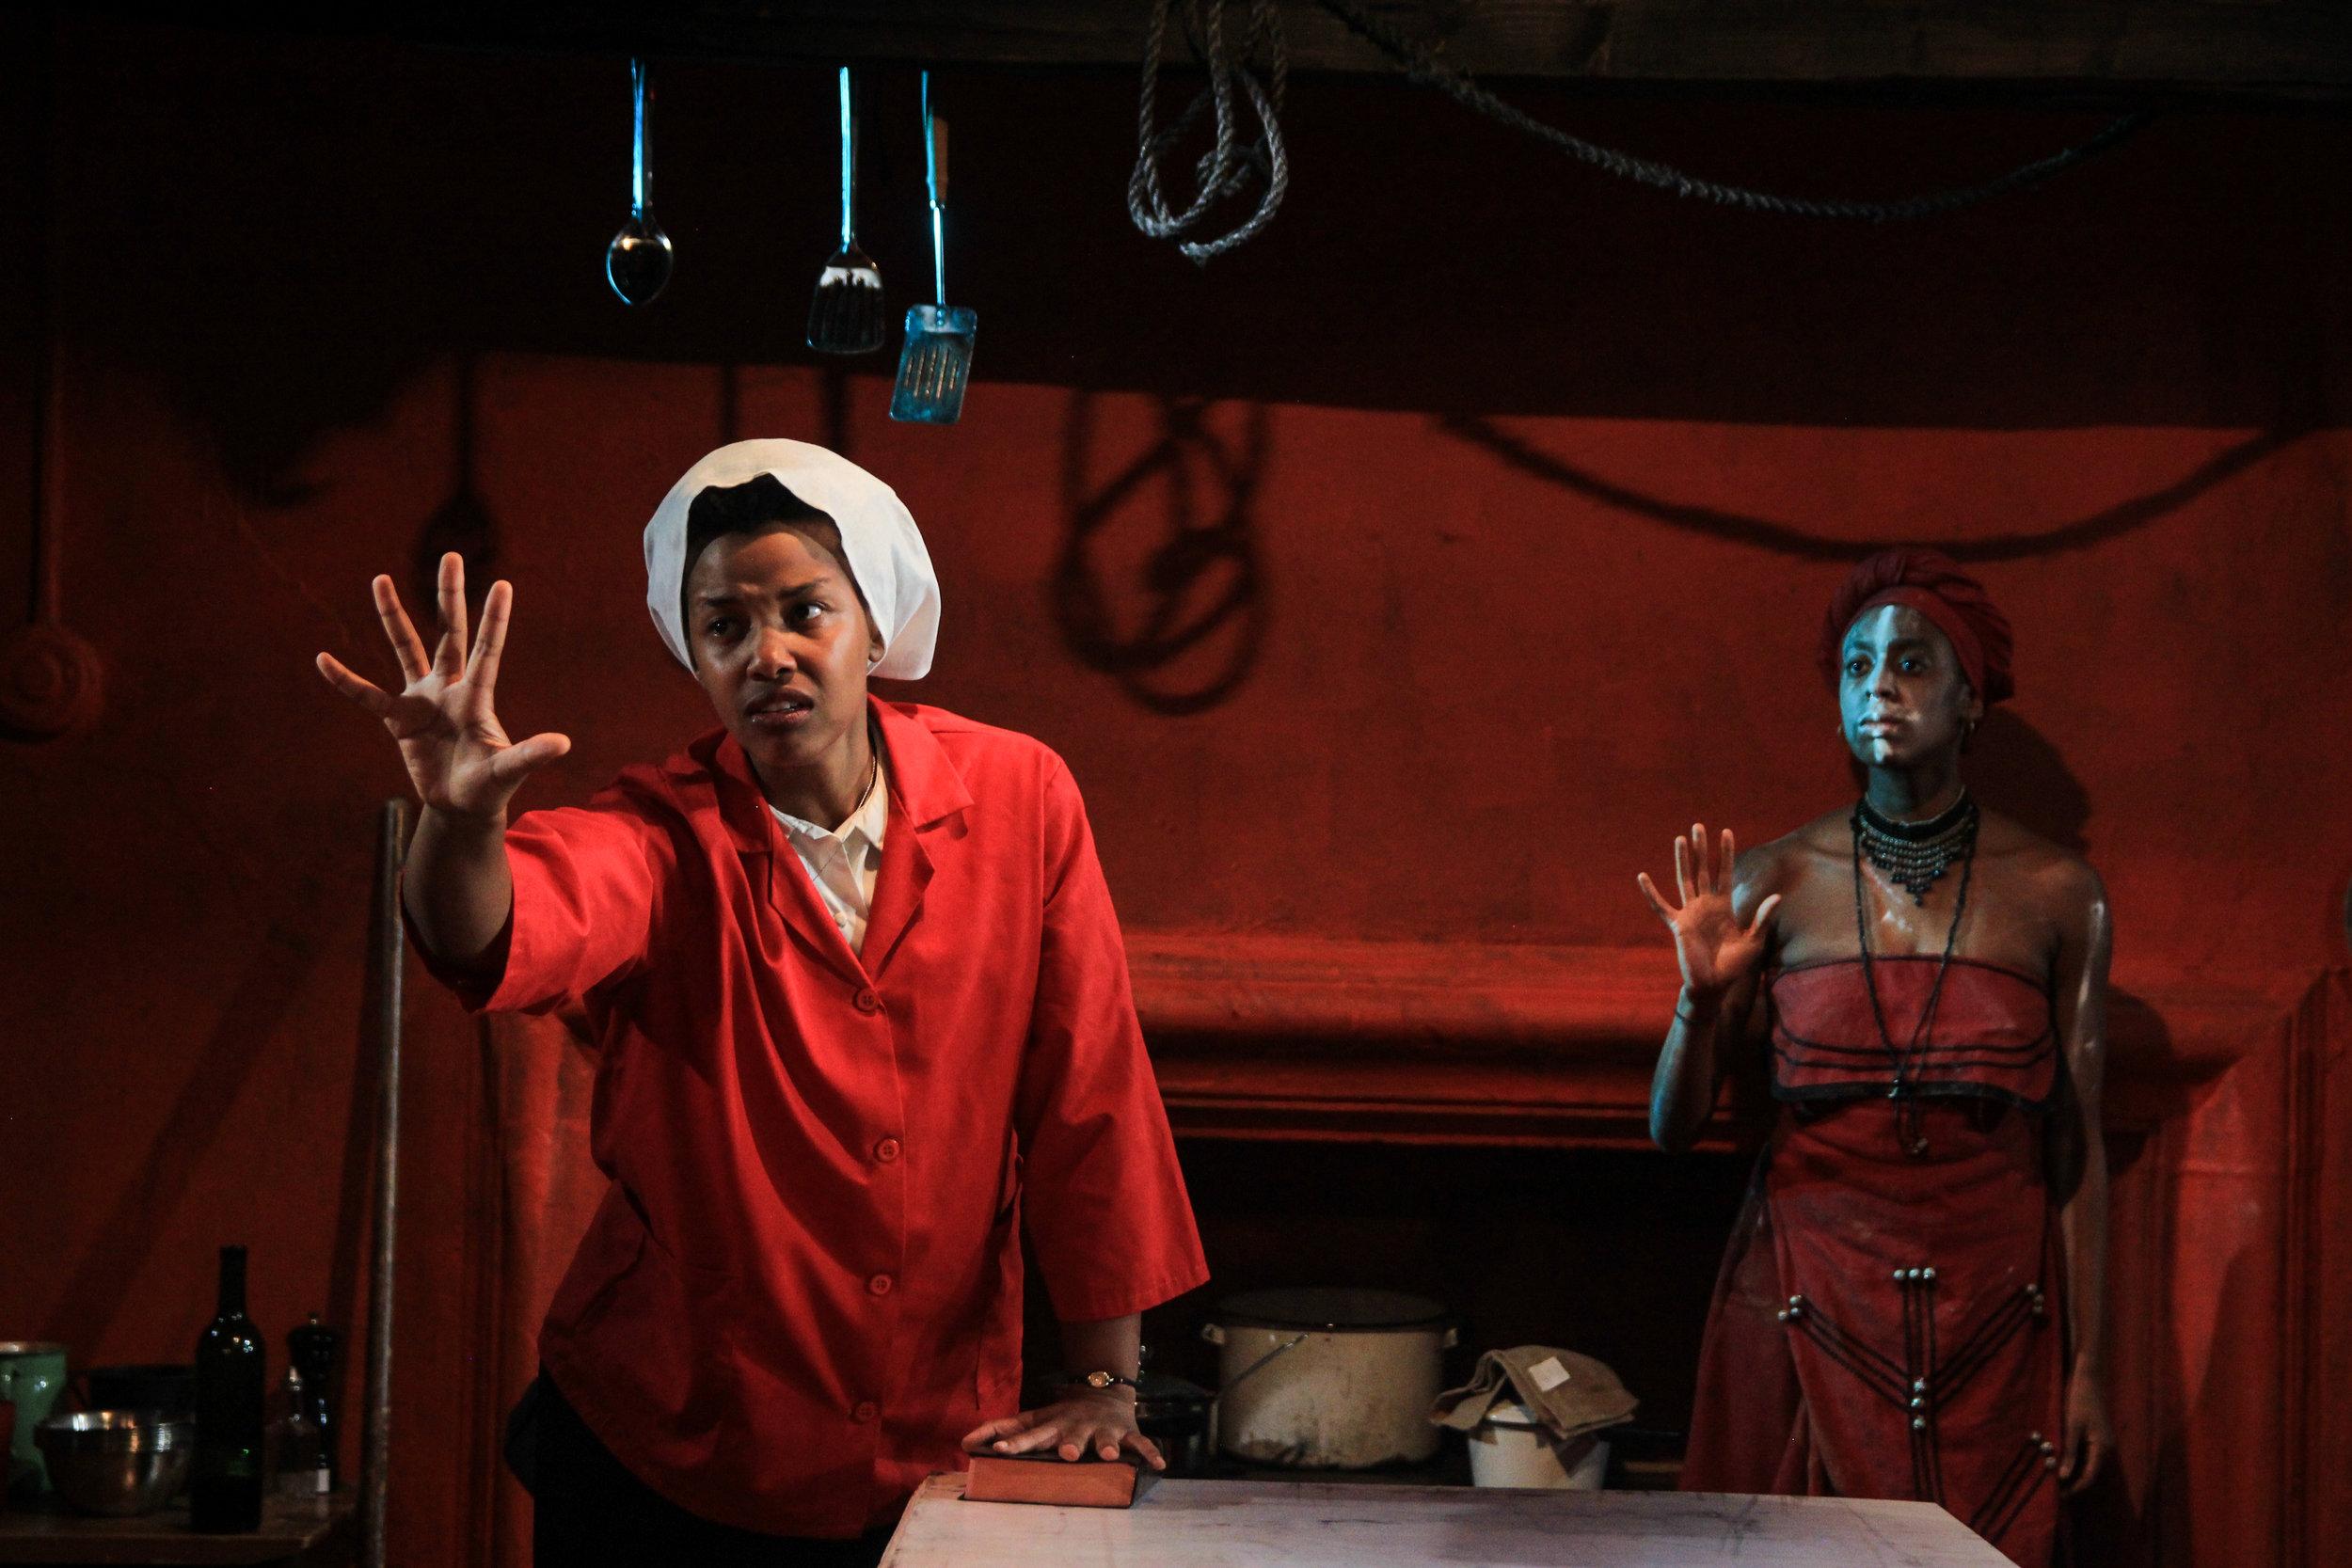 Kineta Kunutu as CHRISTINE, Amandla Jahava as UKHOKHO